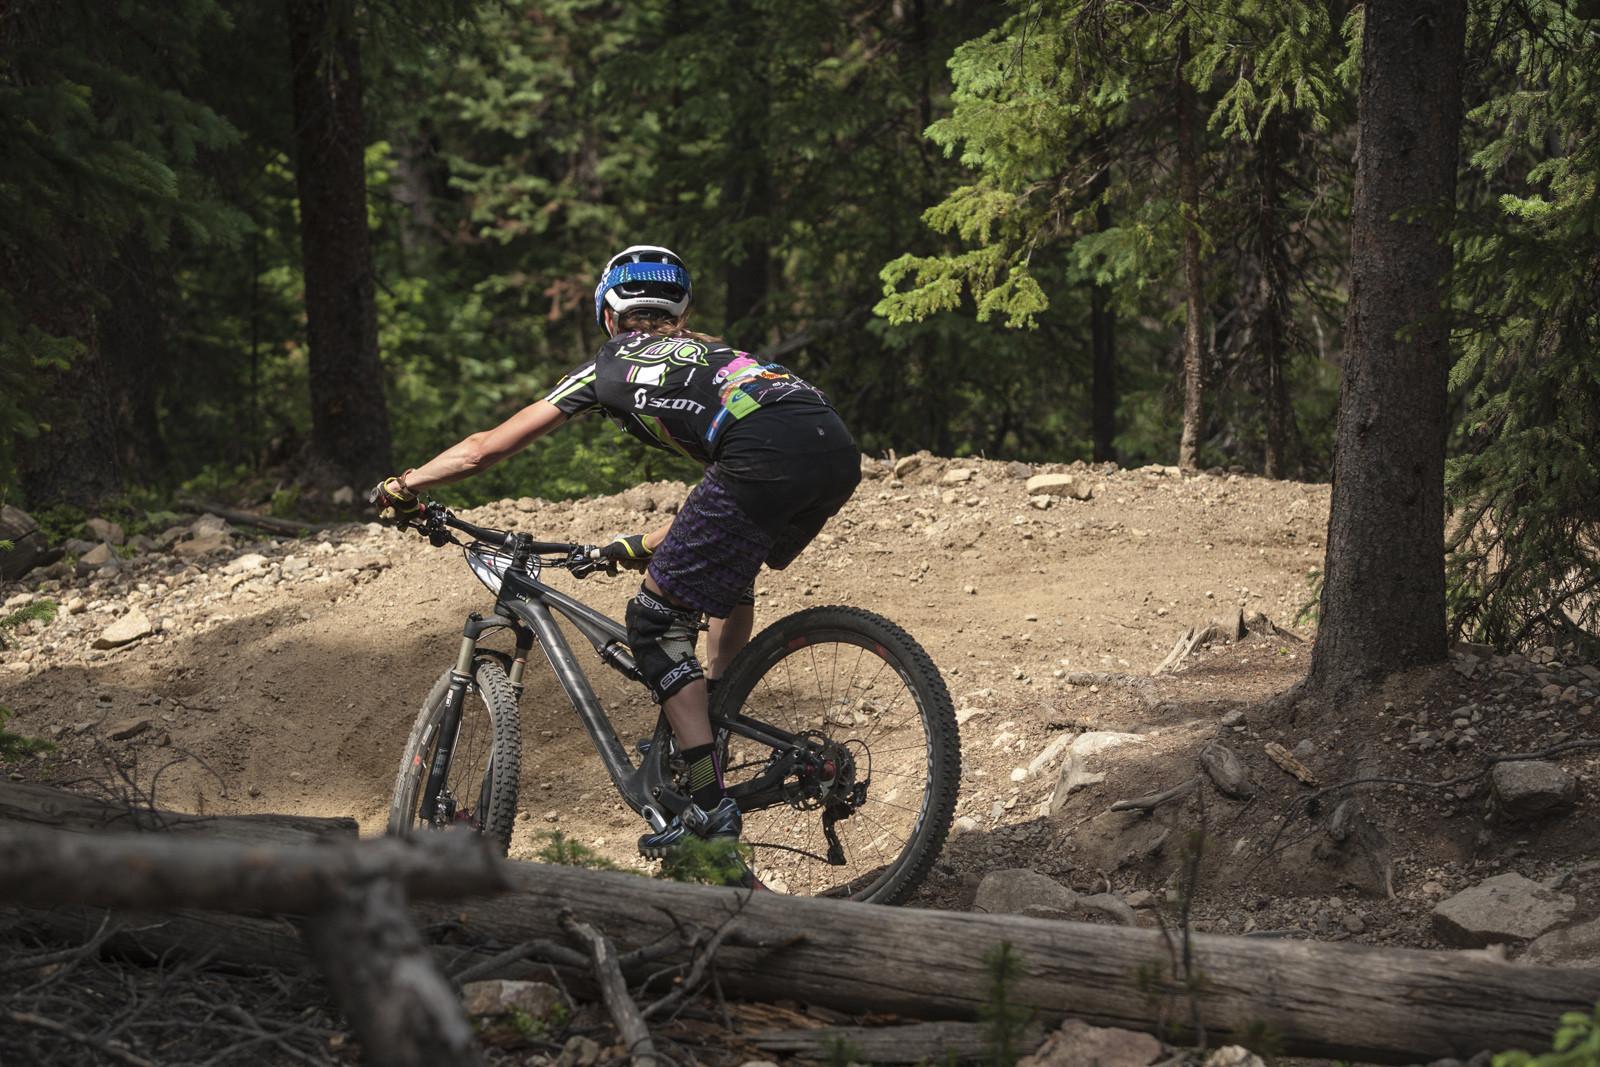 Lea Julson Keystone Big Mountain Enduro - Photos, Videos from the Keystone Big Mountain Enduro, Part of the North American Enduro Tour - Mountain Biking Pictures - Vital MTB